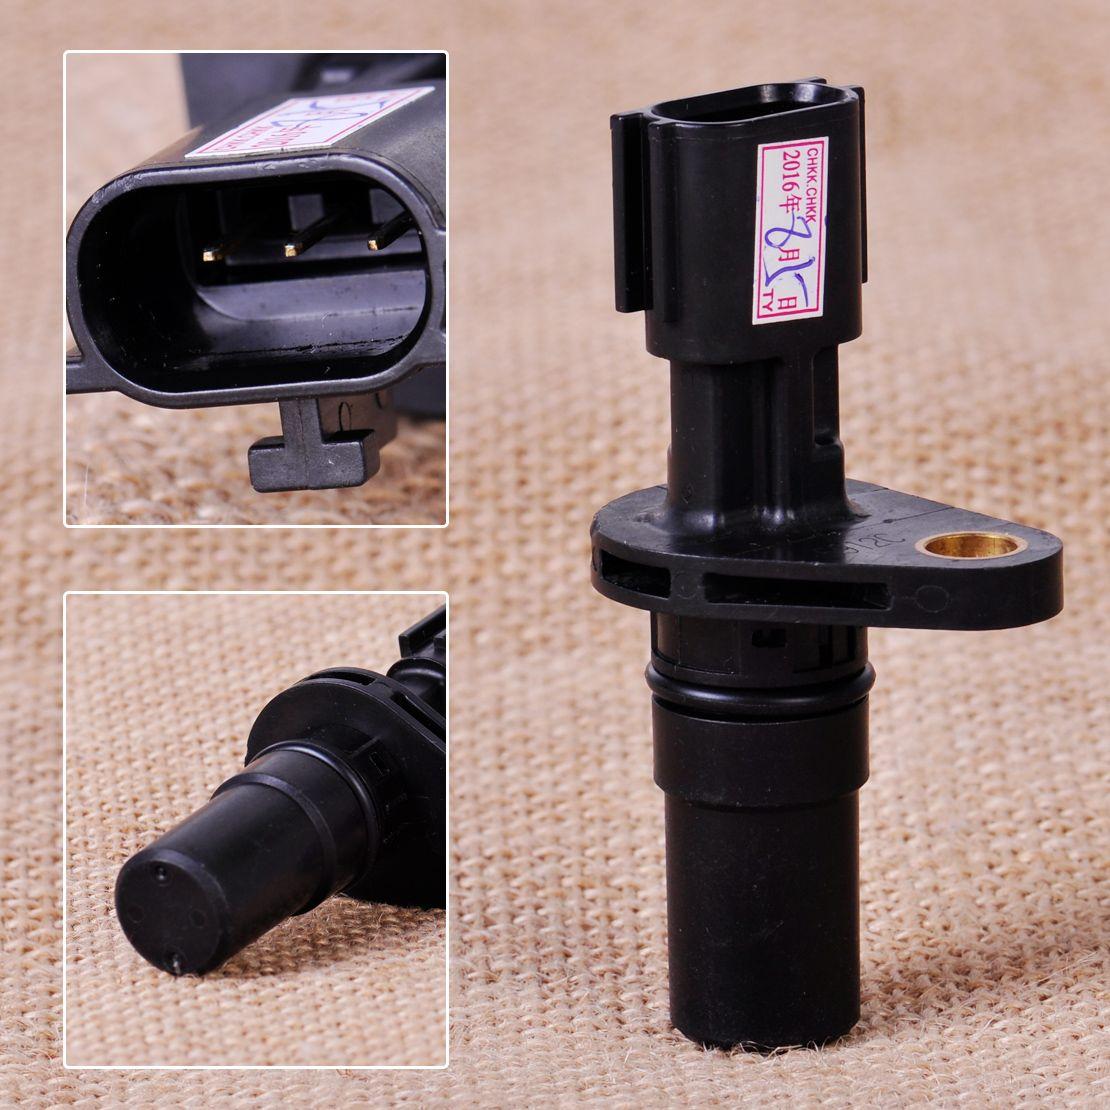 1pc Transmission Speed Sensor 31935 X420b 31935 1xf01 Fit For Nissan Altima Juke Rogue Sentra Versa Nv200 4cyl Nissan Altima Altima Coffee Maker